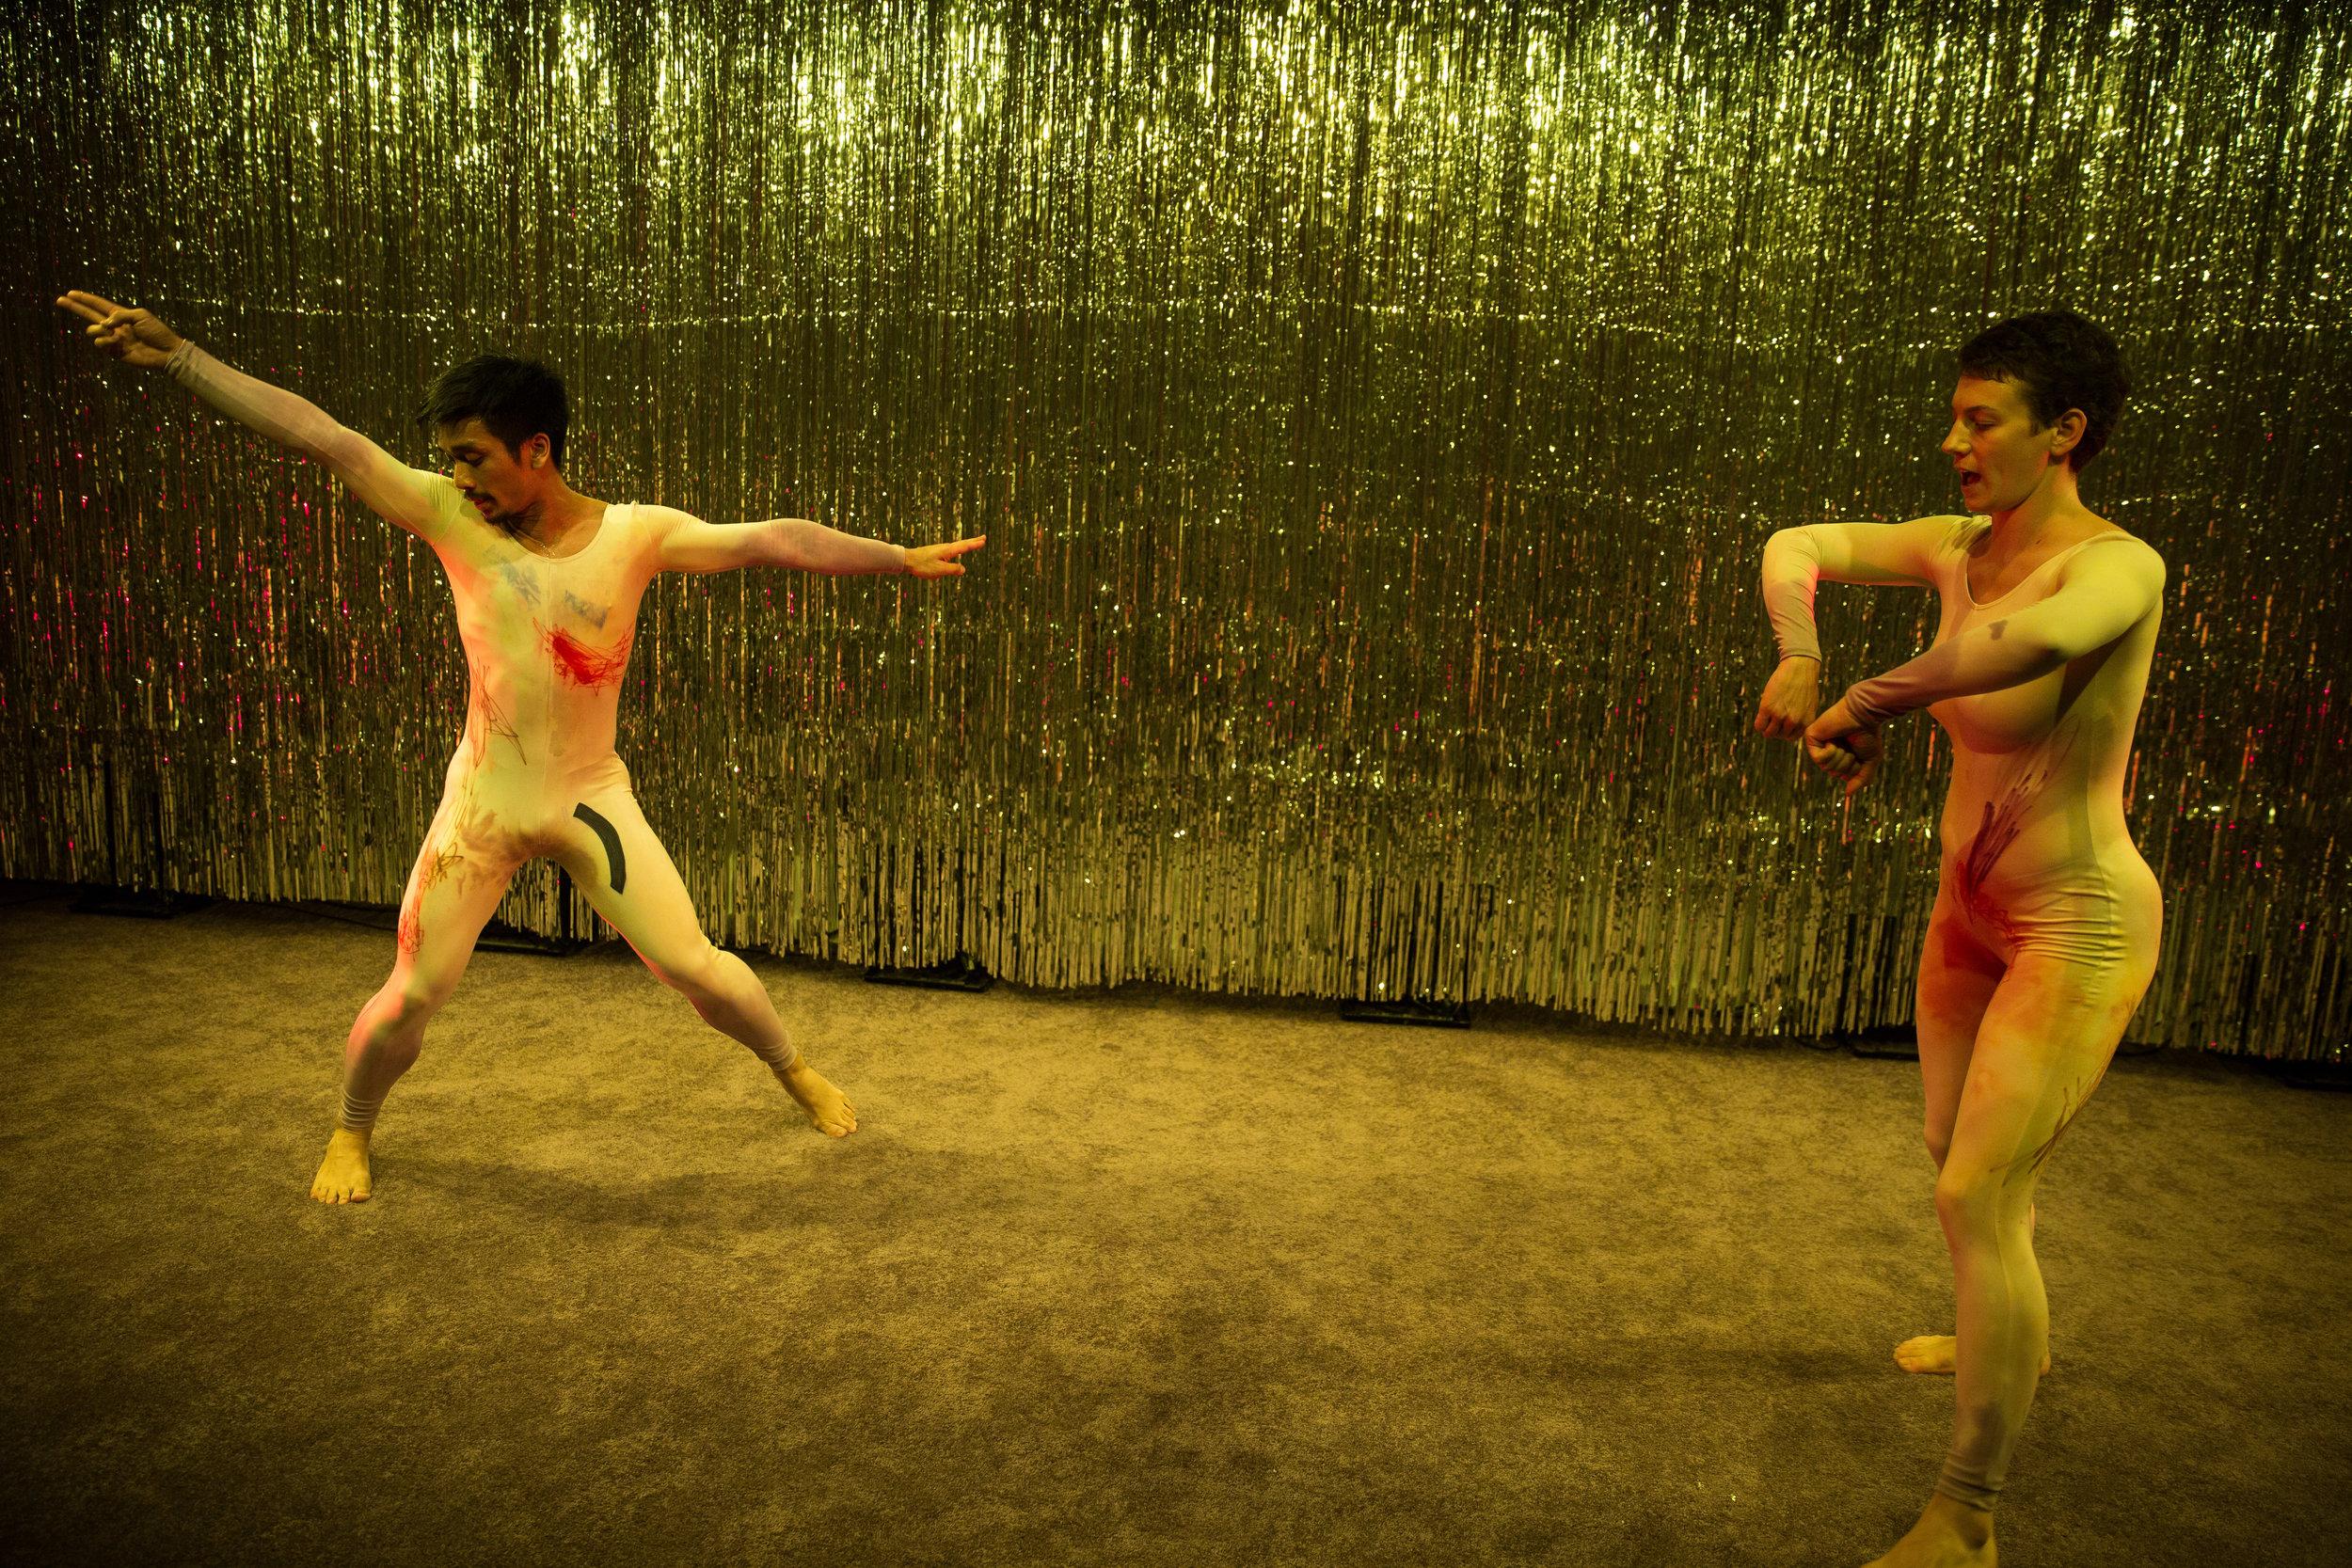 092017-MiriamGabriel&CarloAntonioVillanueva-Untitled(DuetinA)-byScottShaw-15.jpg